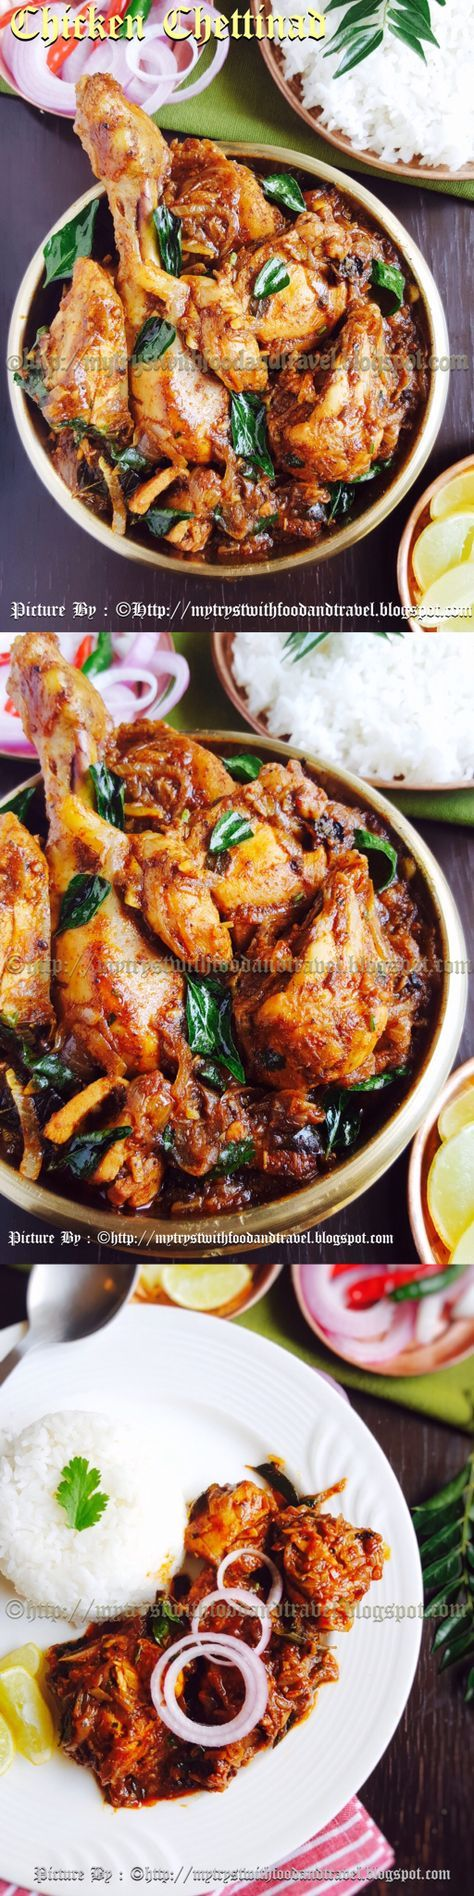 chicken chettinad recipe chettinad chicken curry recipe chennai food adventure series eat on hebbar s kitchen chicken recipes id=60712